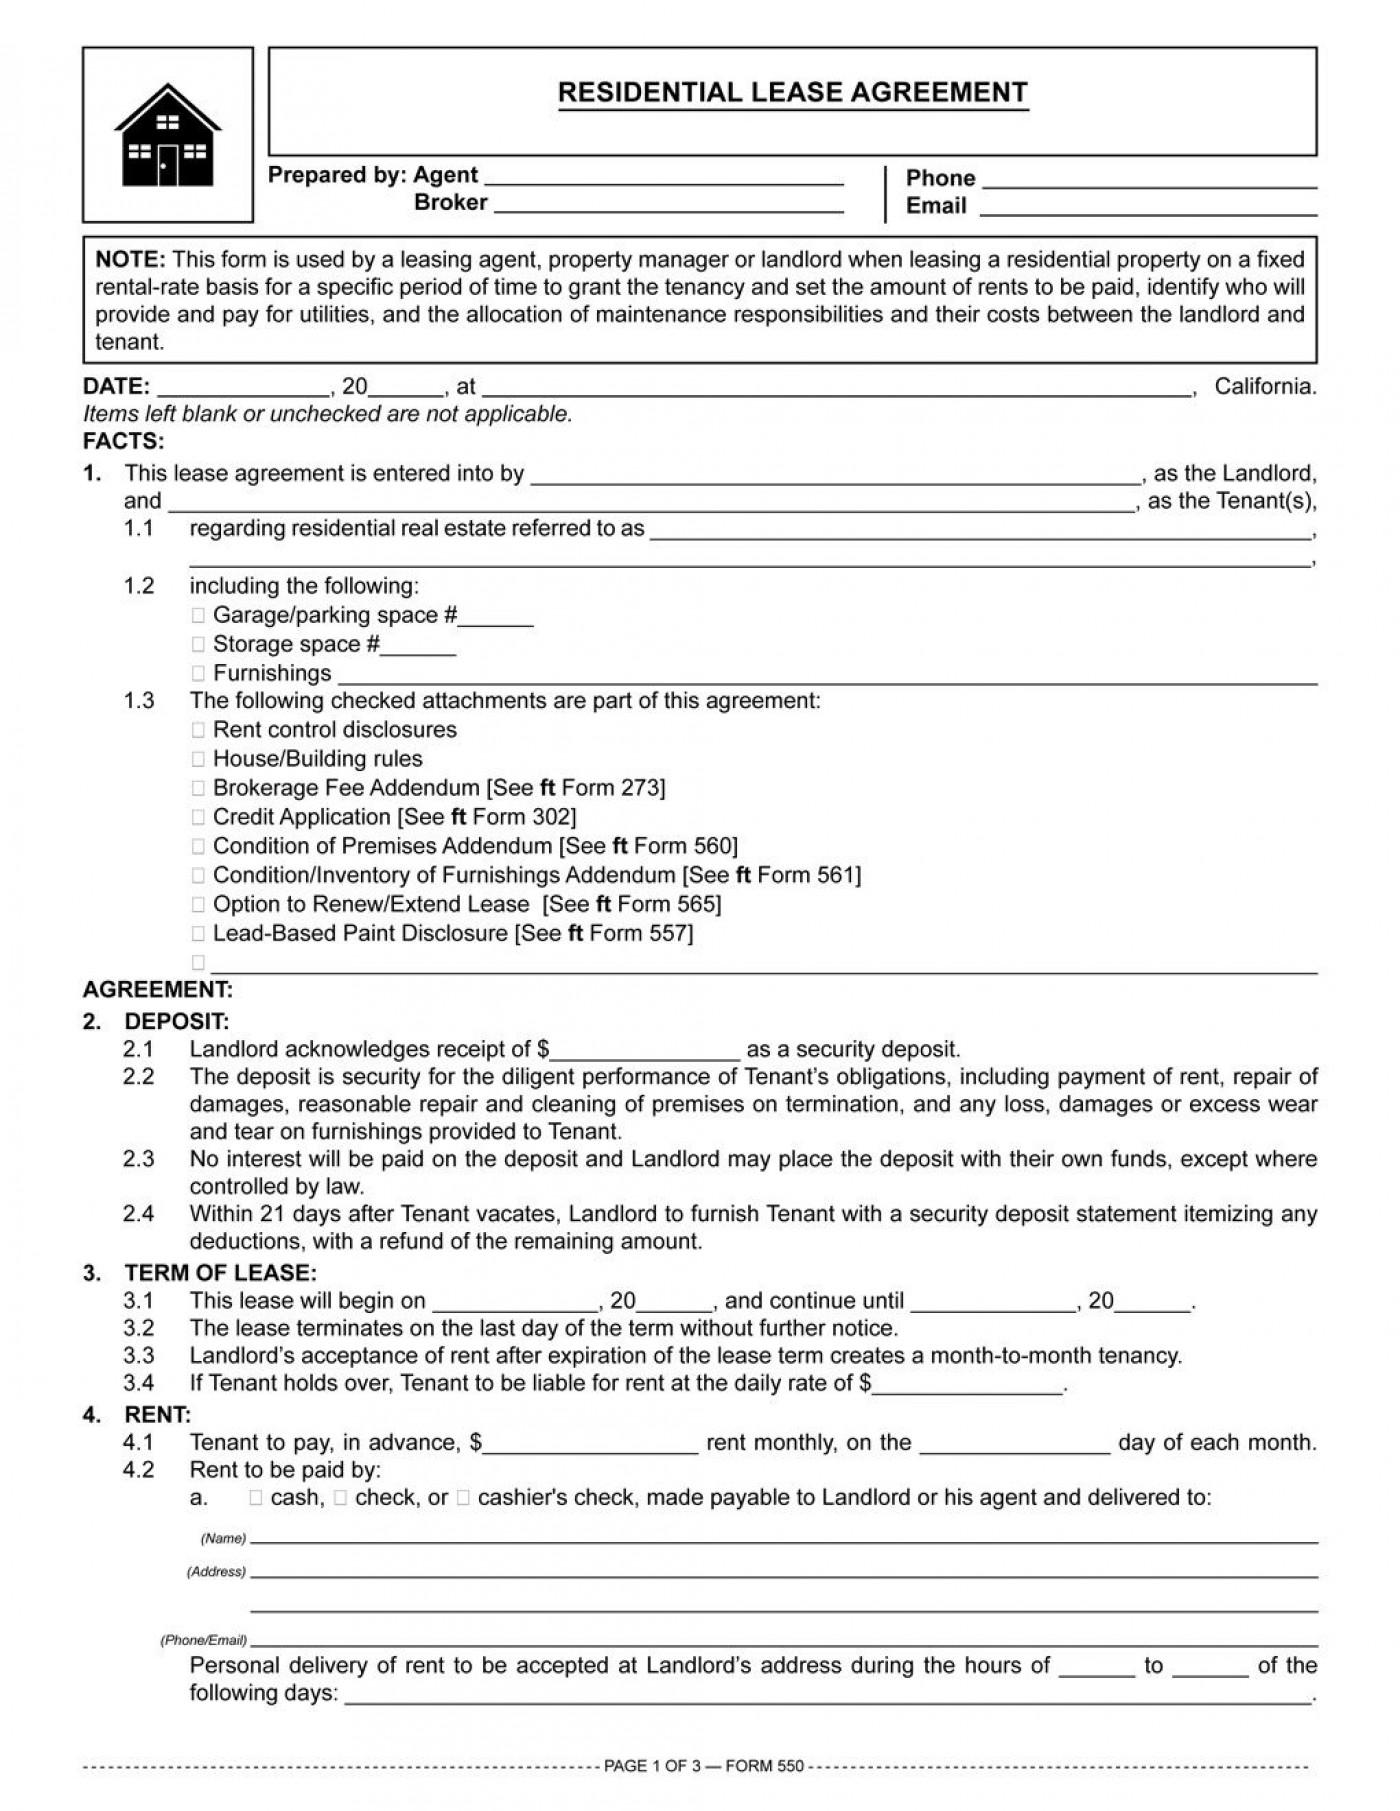 002 Fantastic Residential Lease Agreement Template Idea  Tenancy Form Alberta California1400